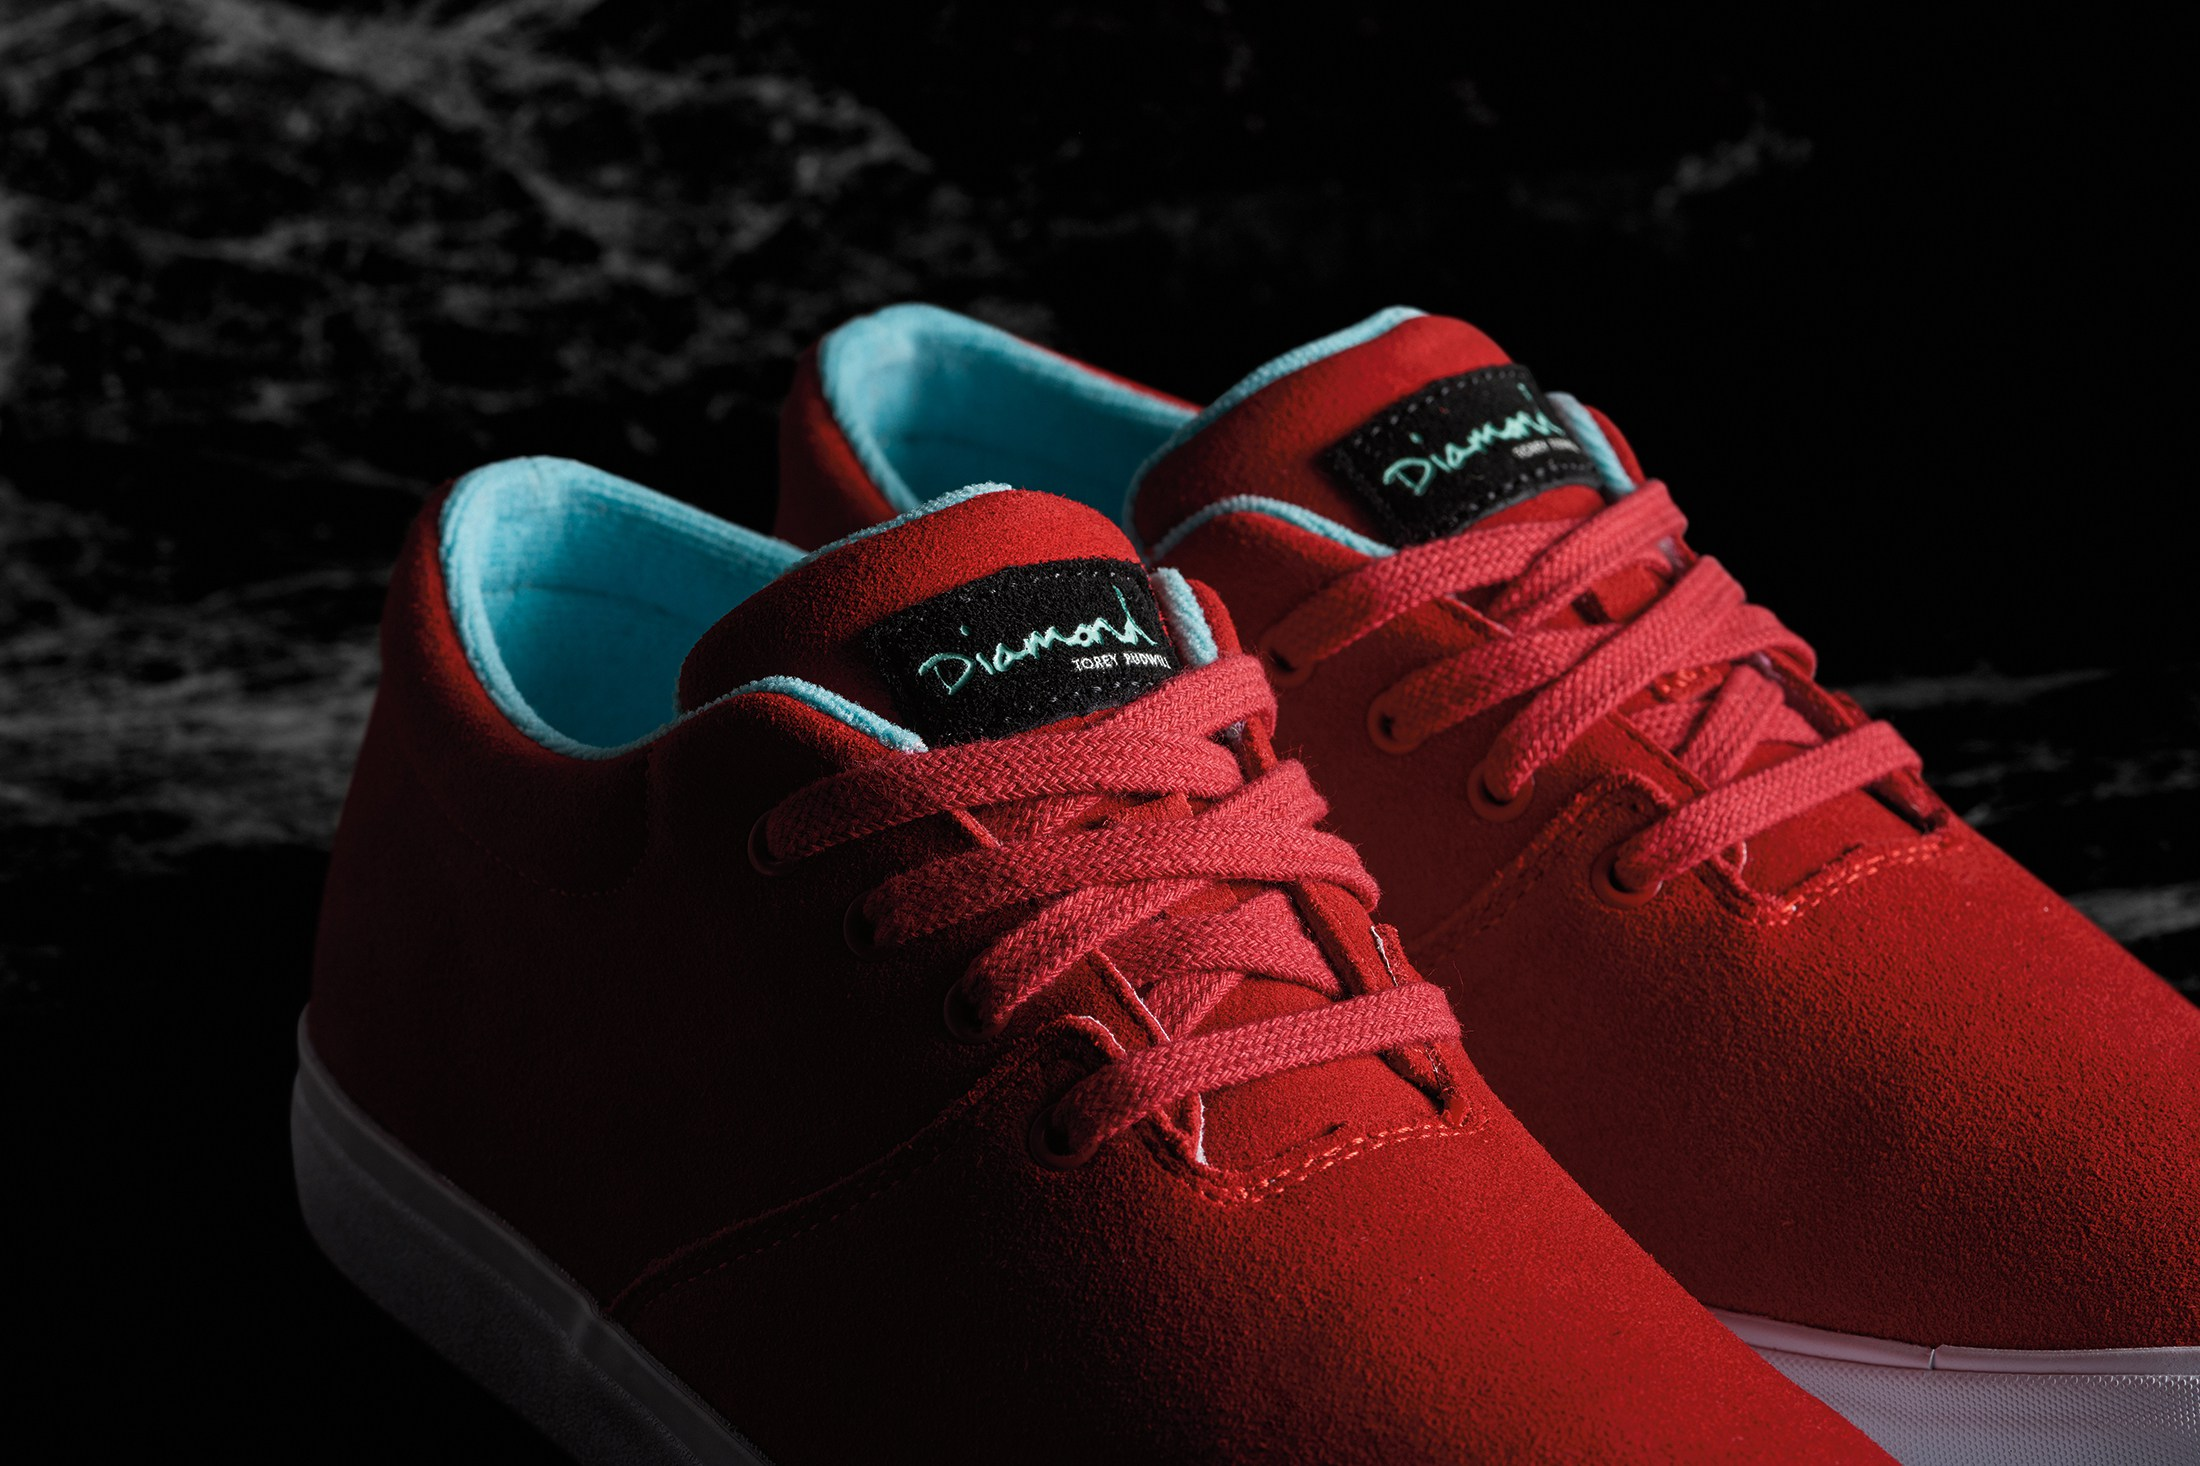 diamond-supply-co-launches-footwear-10.jpg